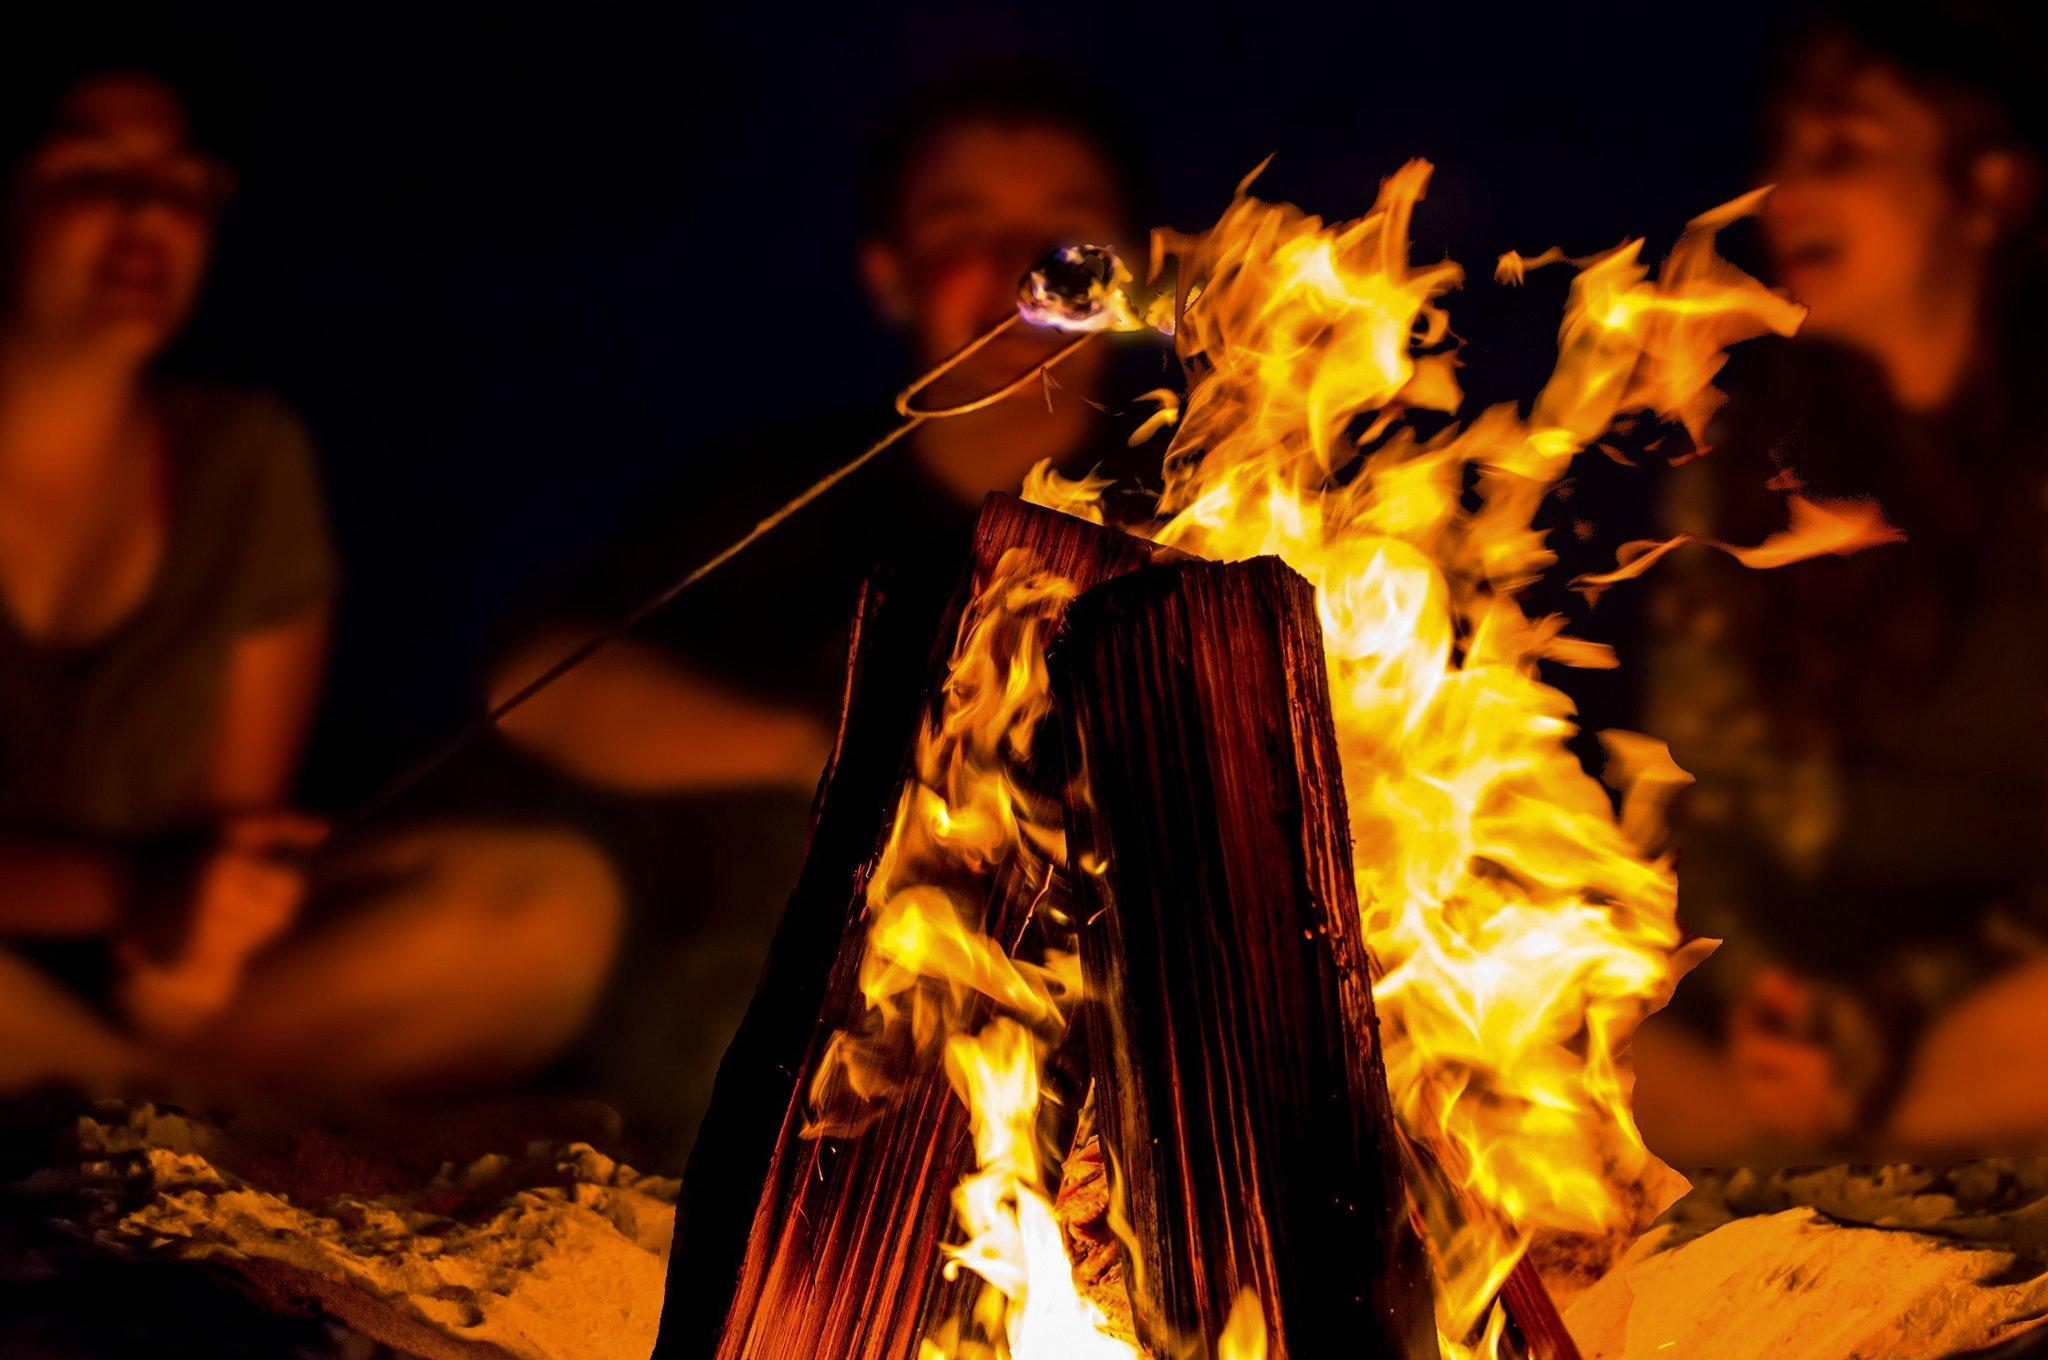 Smores on Campfire